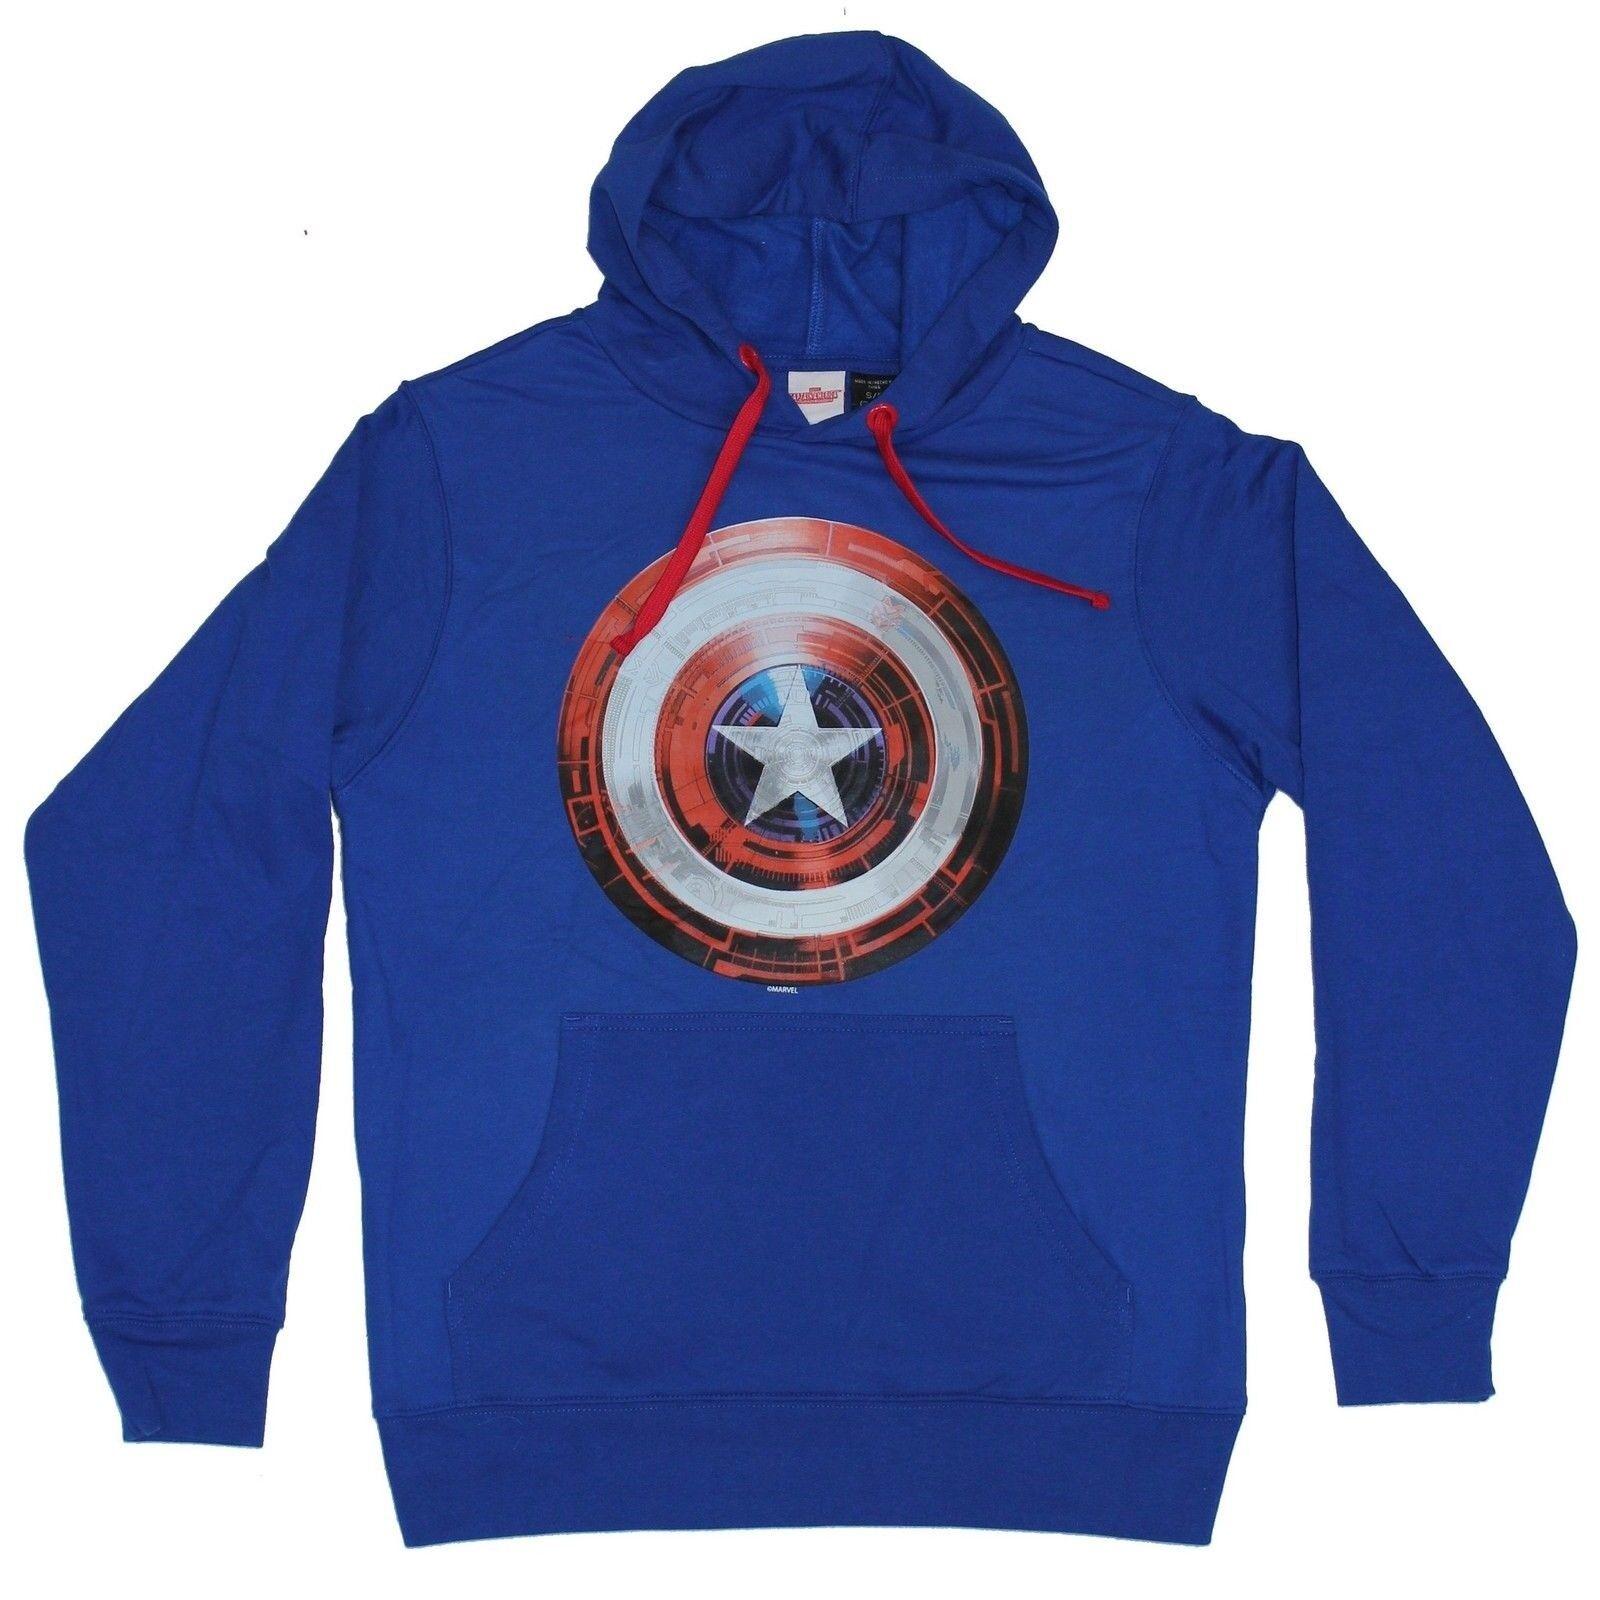 Captain America (Marvel) Pull Over Hoodie- Shining Full Farbe Shield Logo Image